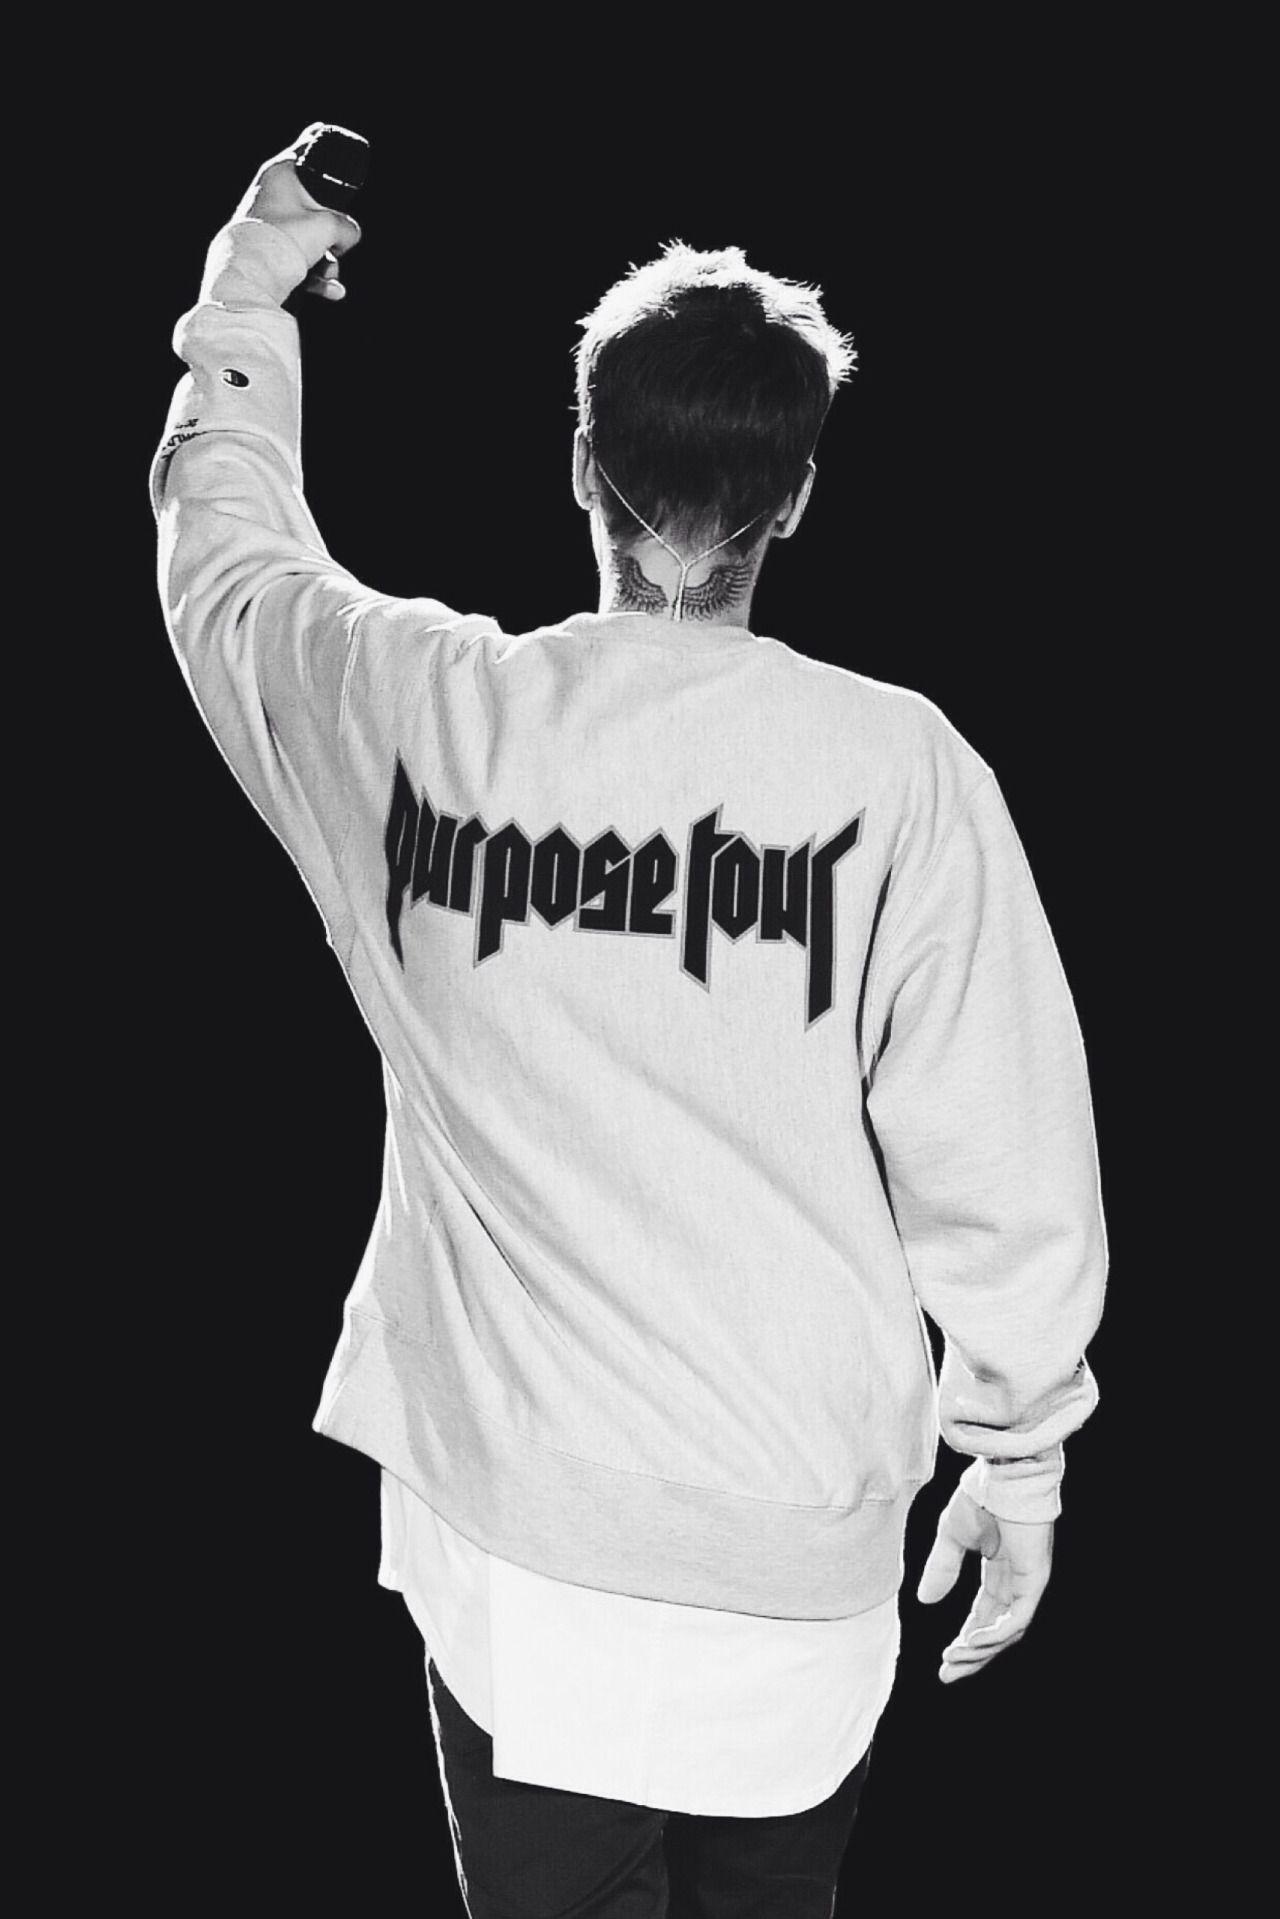 Justin Bieber Wallpapers Justin Bieber Justin Bieber Wallpaper